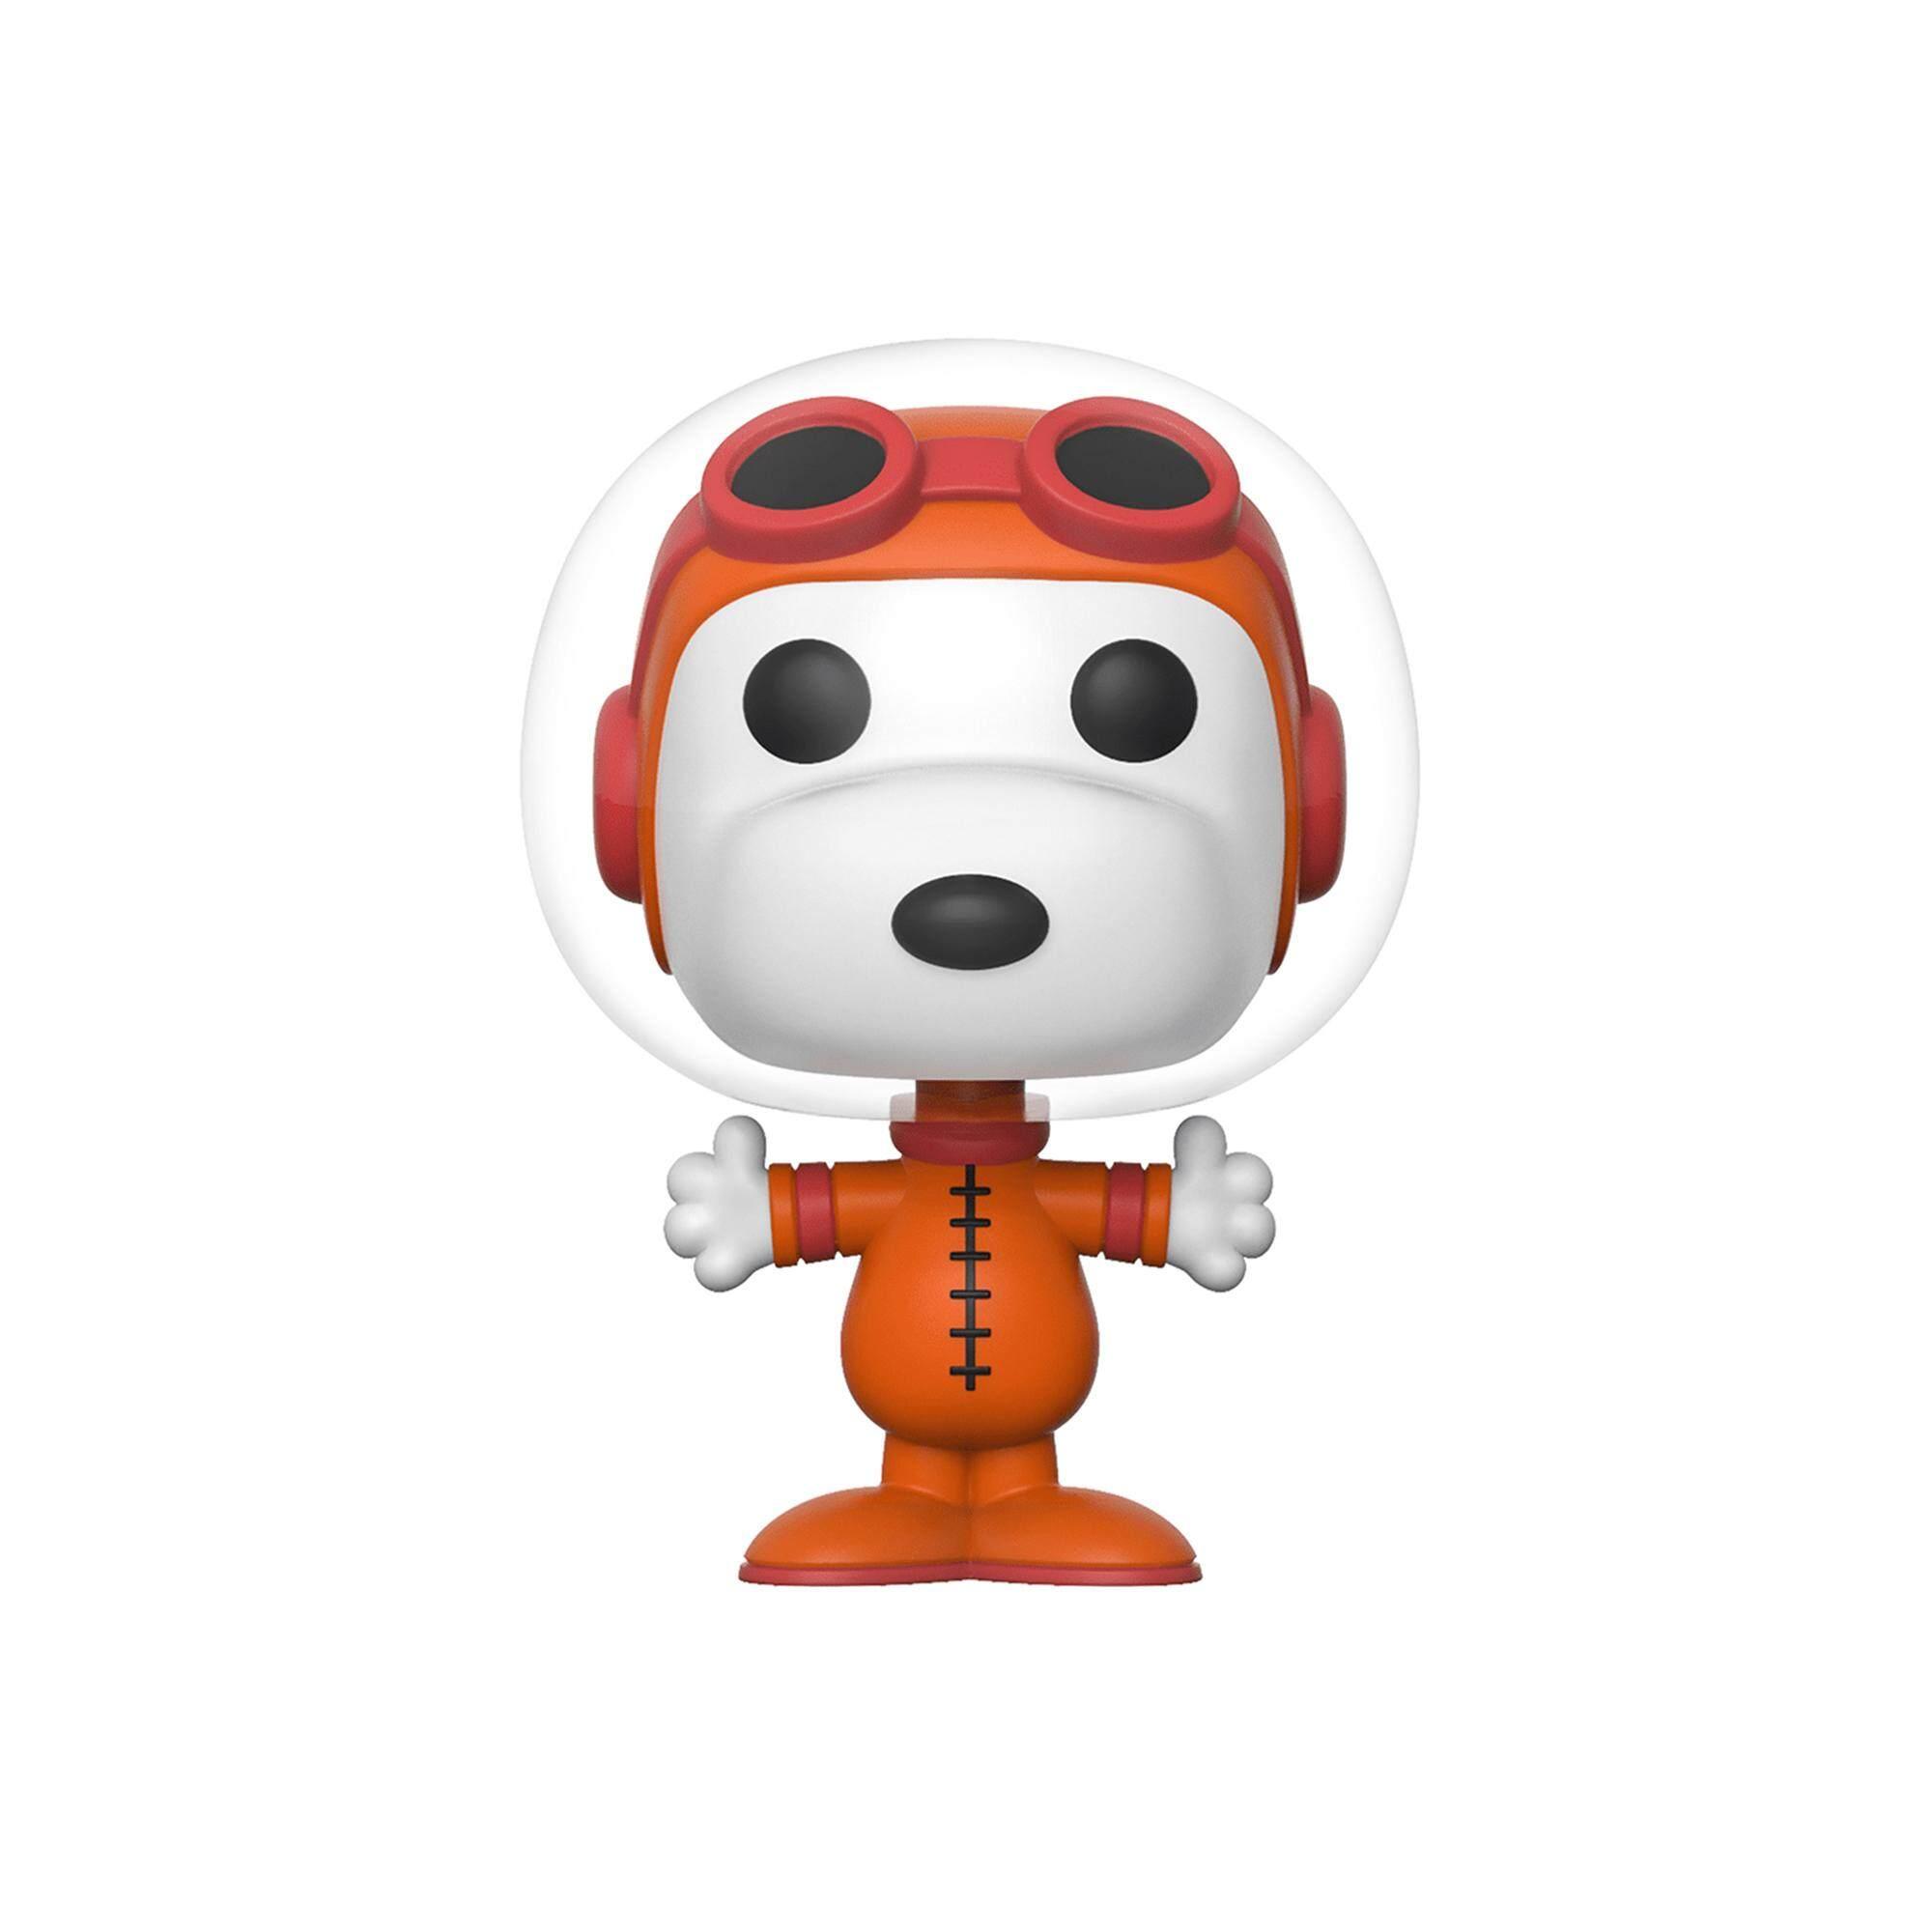 Funko Pop! Animation: Peanuts - Astronaut Snoopy [Sdcc 2019]